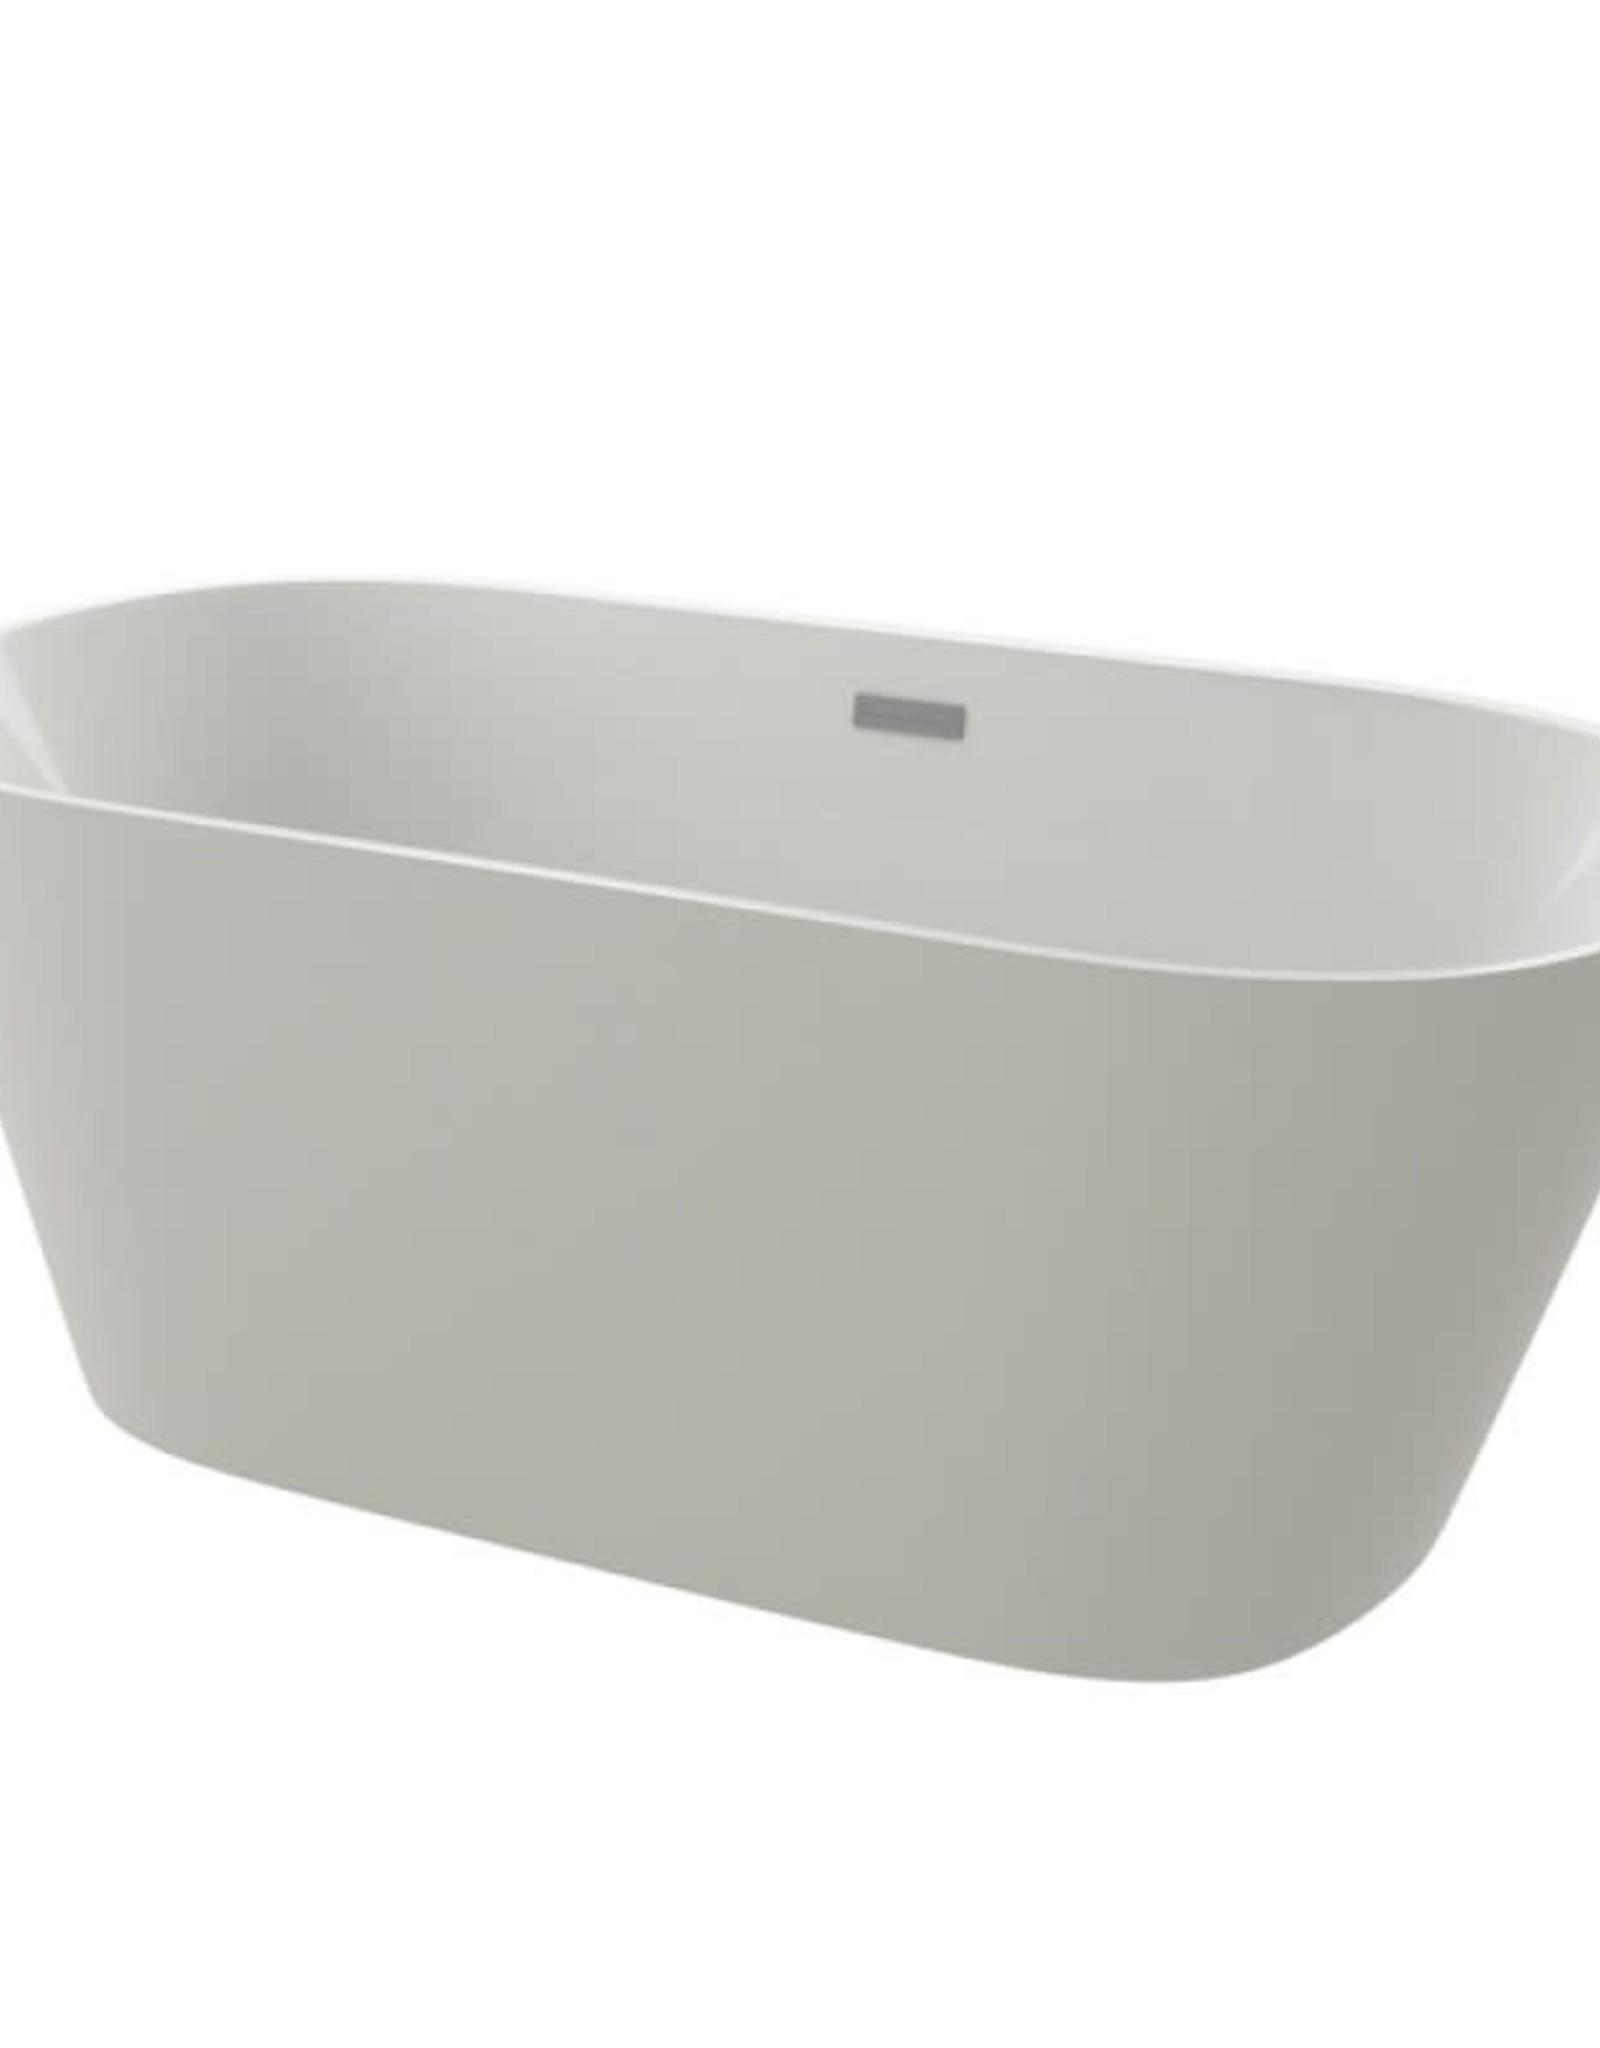 "Bain Signature Anabelle 59"" Freestanding Tub"